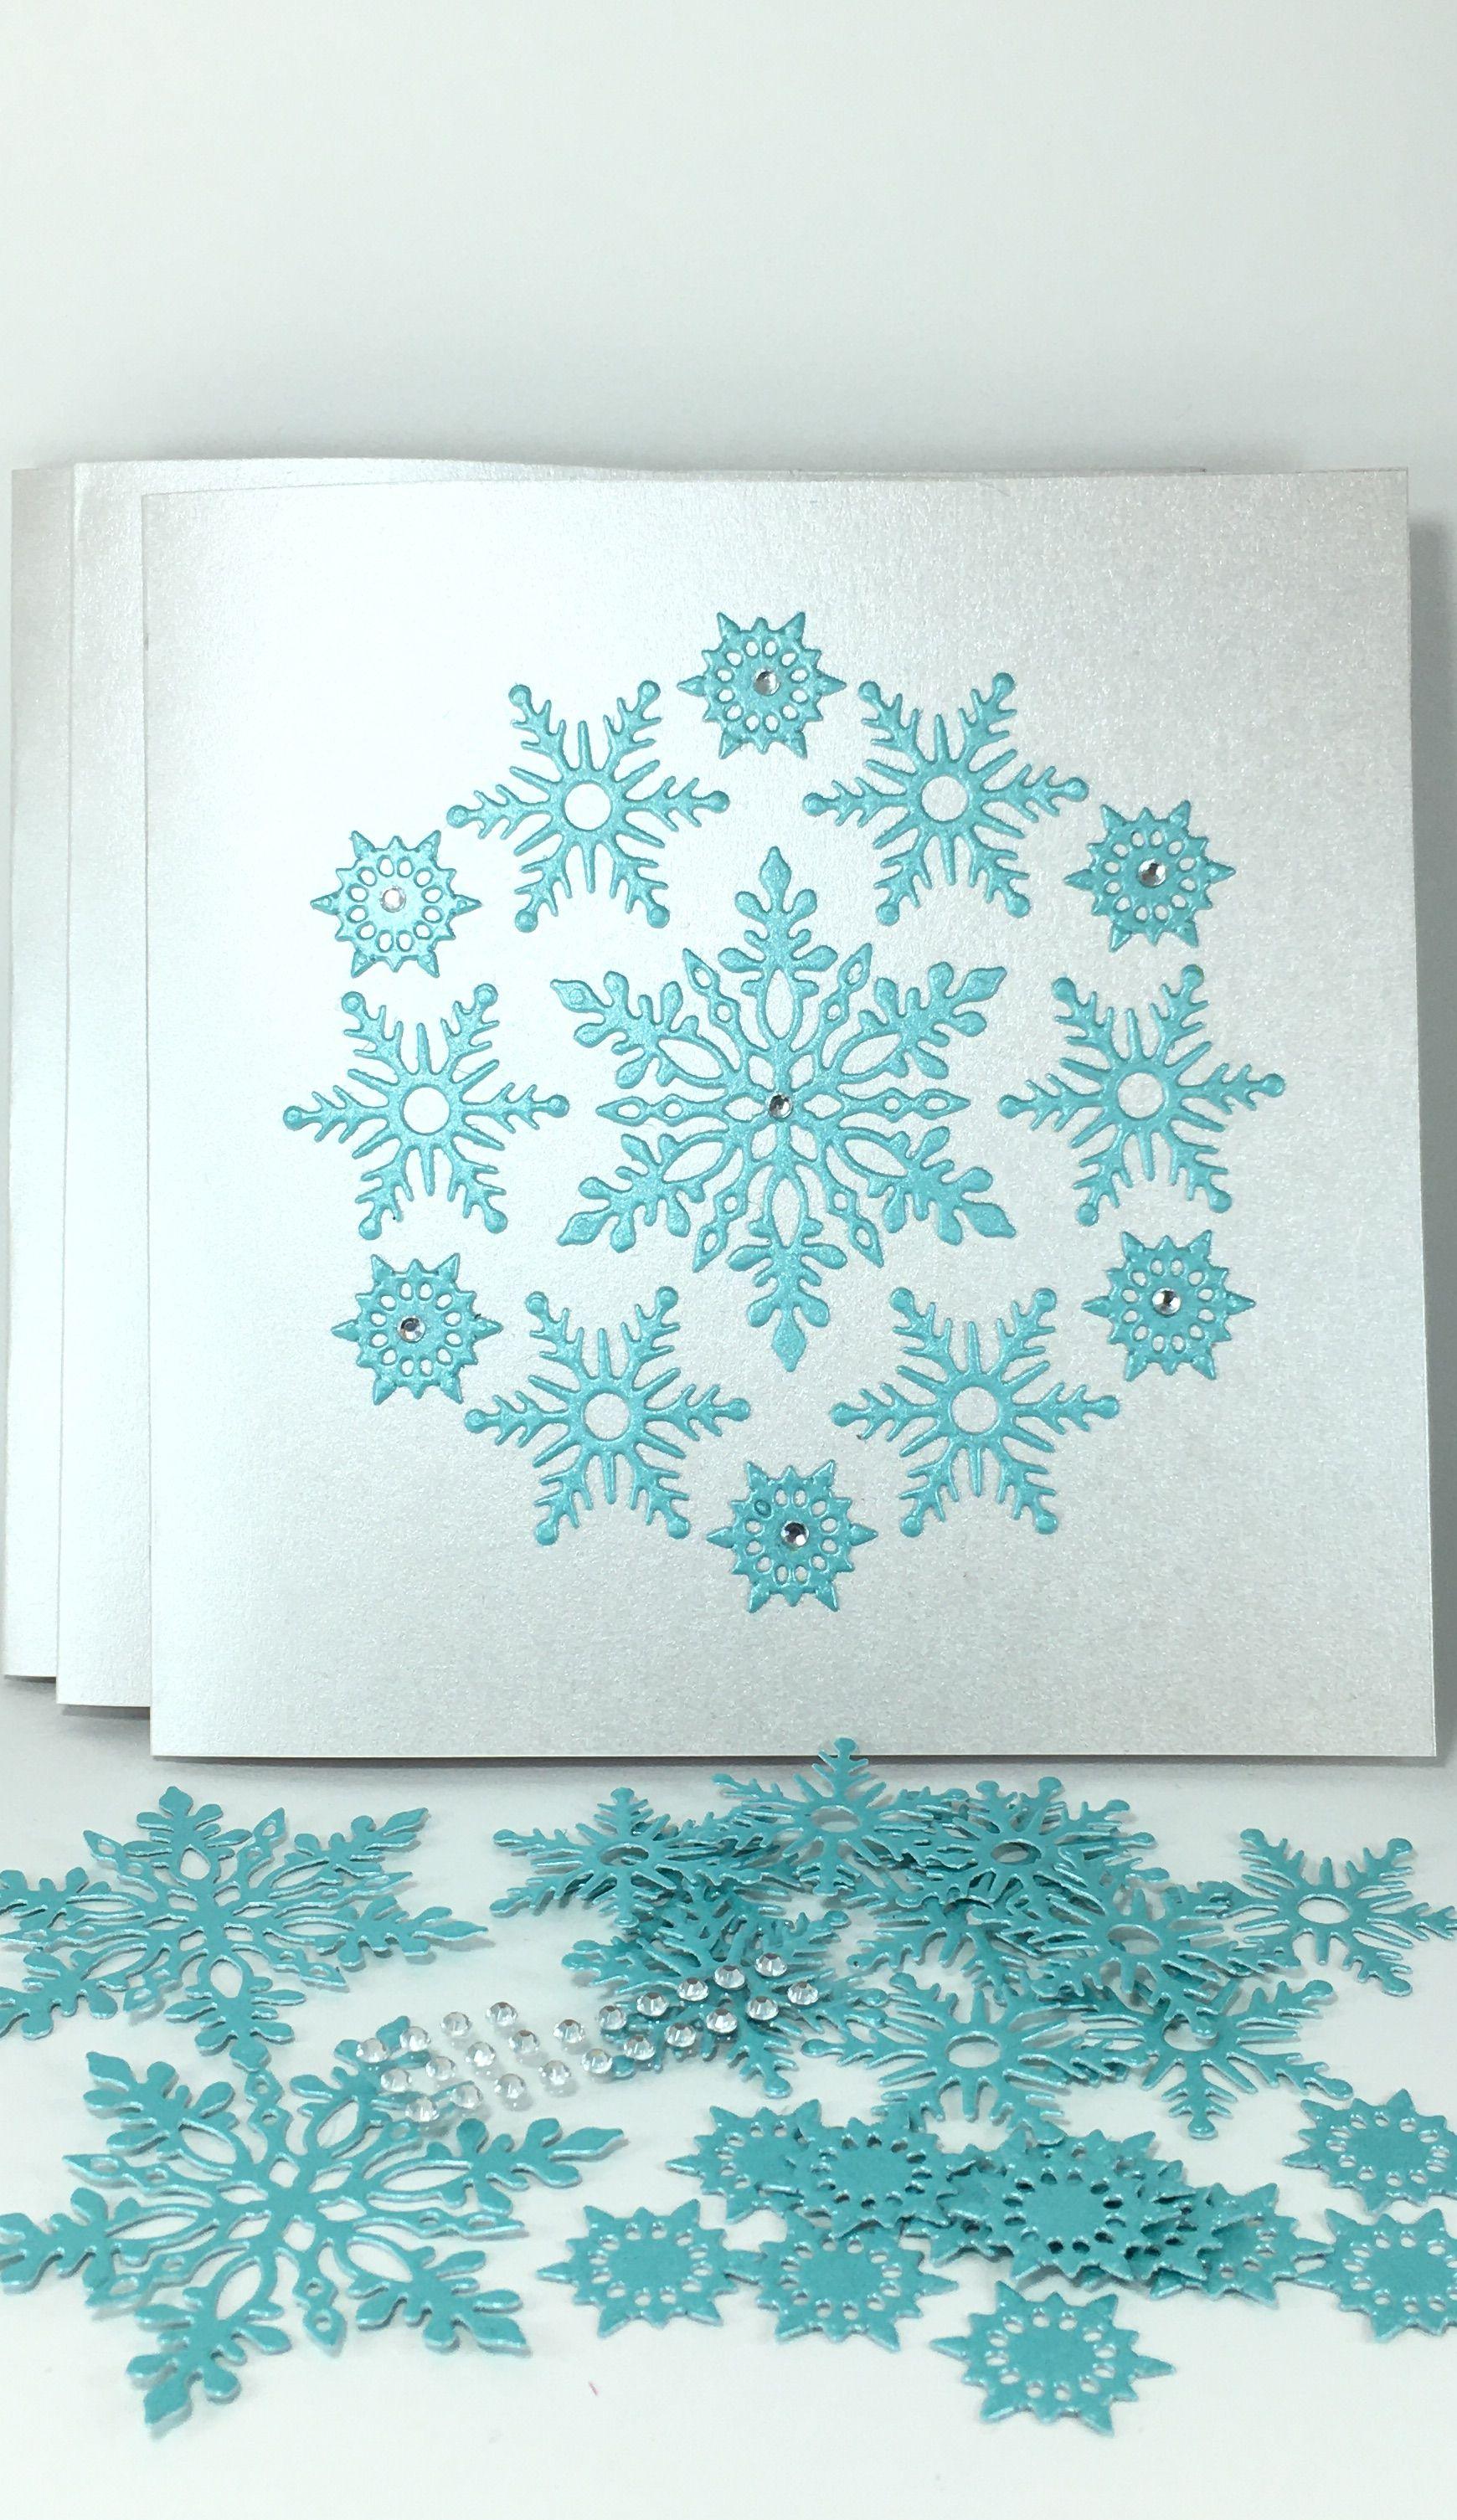 Luxury Christmas Card Making Kit Diy Christmas Card Kit Etsy In 2020 Christmas Cards To Make Card Making Kits Christmas Card Making Kits